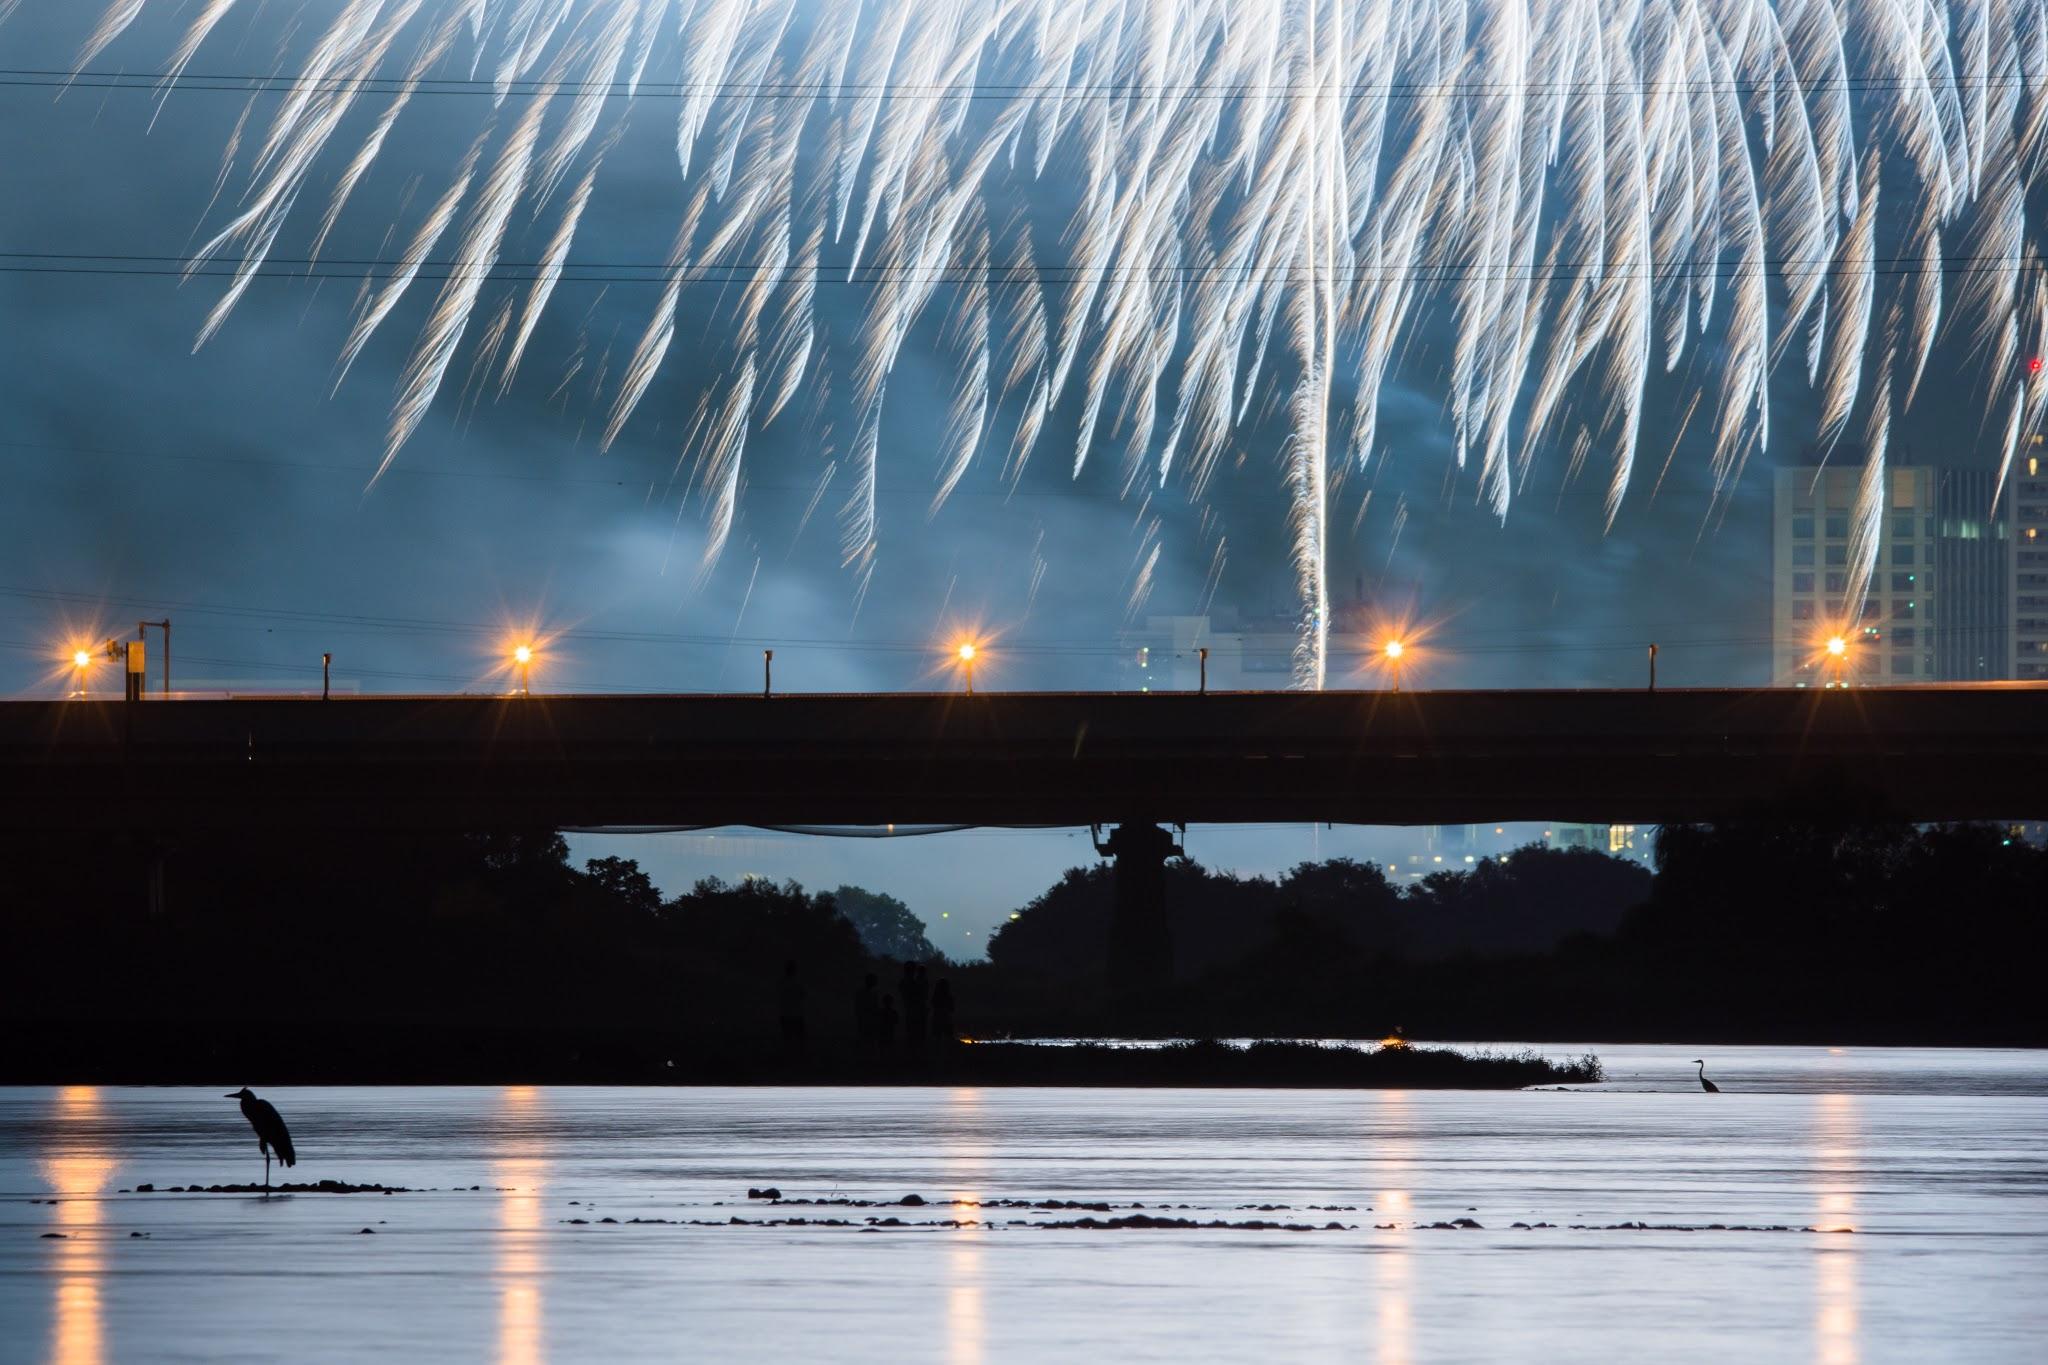 Photo: 花火見物 Fireworks enjoyed.  花火を見に河原へ訪れる 次々と打ち上げられる花火に 照らされる川面 先客たちの影が浮かぶ  (第37回世田谷区たまがわ花火大会)  #cooljapan #hanabi2015 #nikon #sigma #fireworks  Nikon D7200 SIGMA 150-600mm F5-6.3 DG OS HSM Contemporary (3枚追加:Added 3 photo)